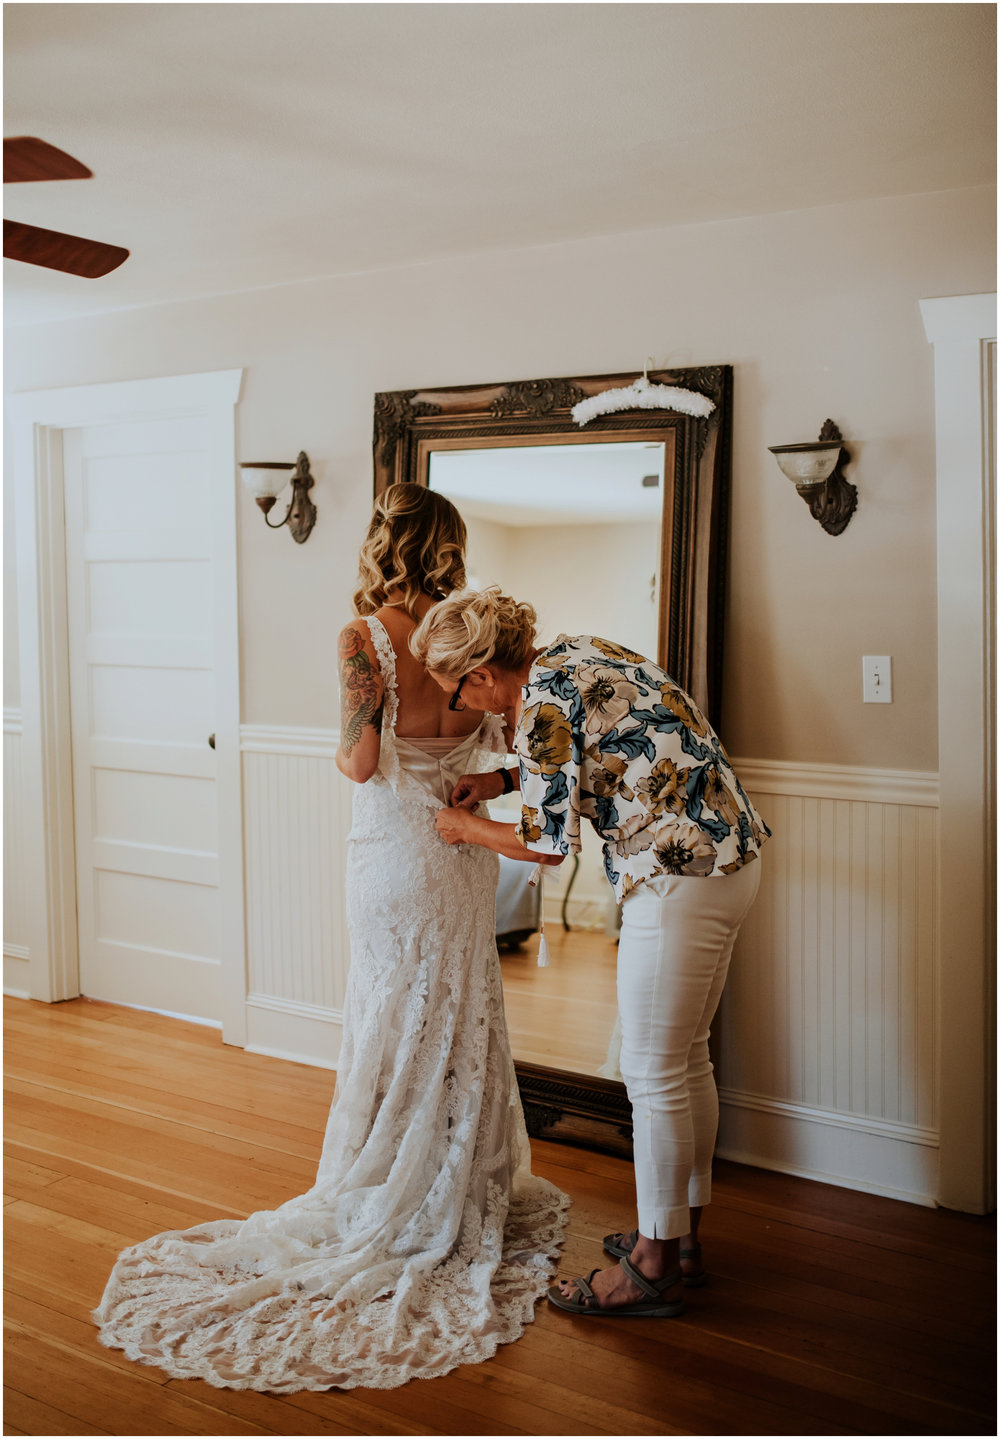 mona-and-matthew-the-kelley-farm-wedding-seattle-washington-wedding-photographer-18.jpg